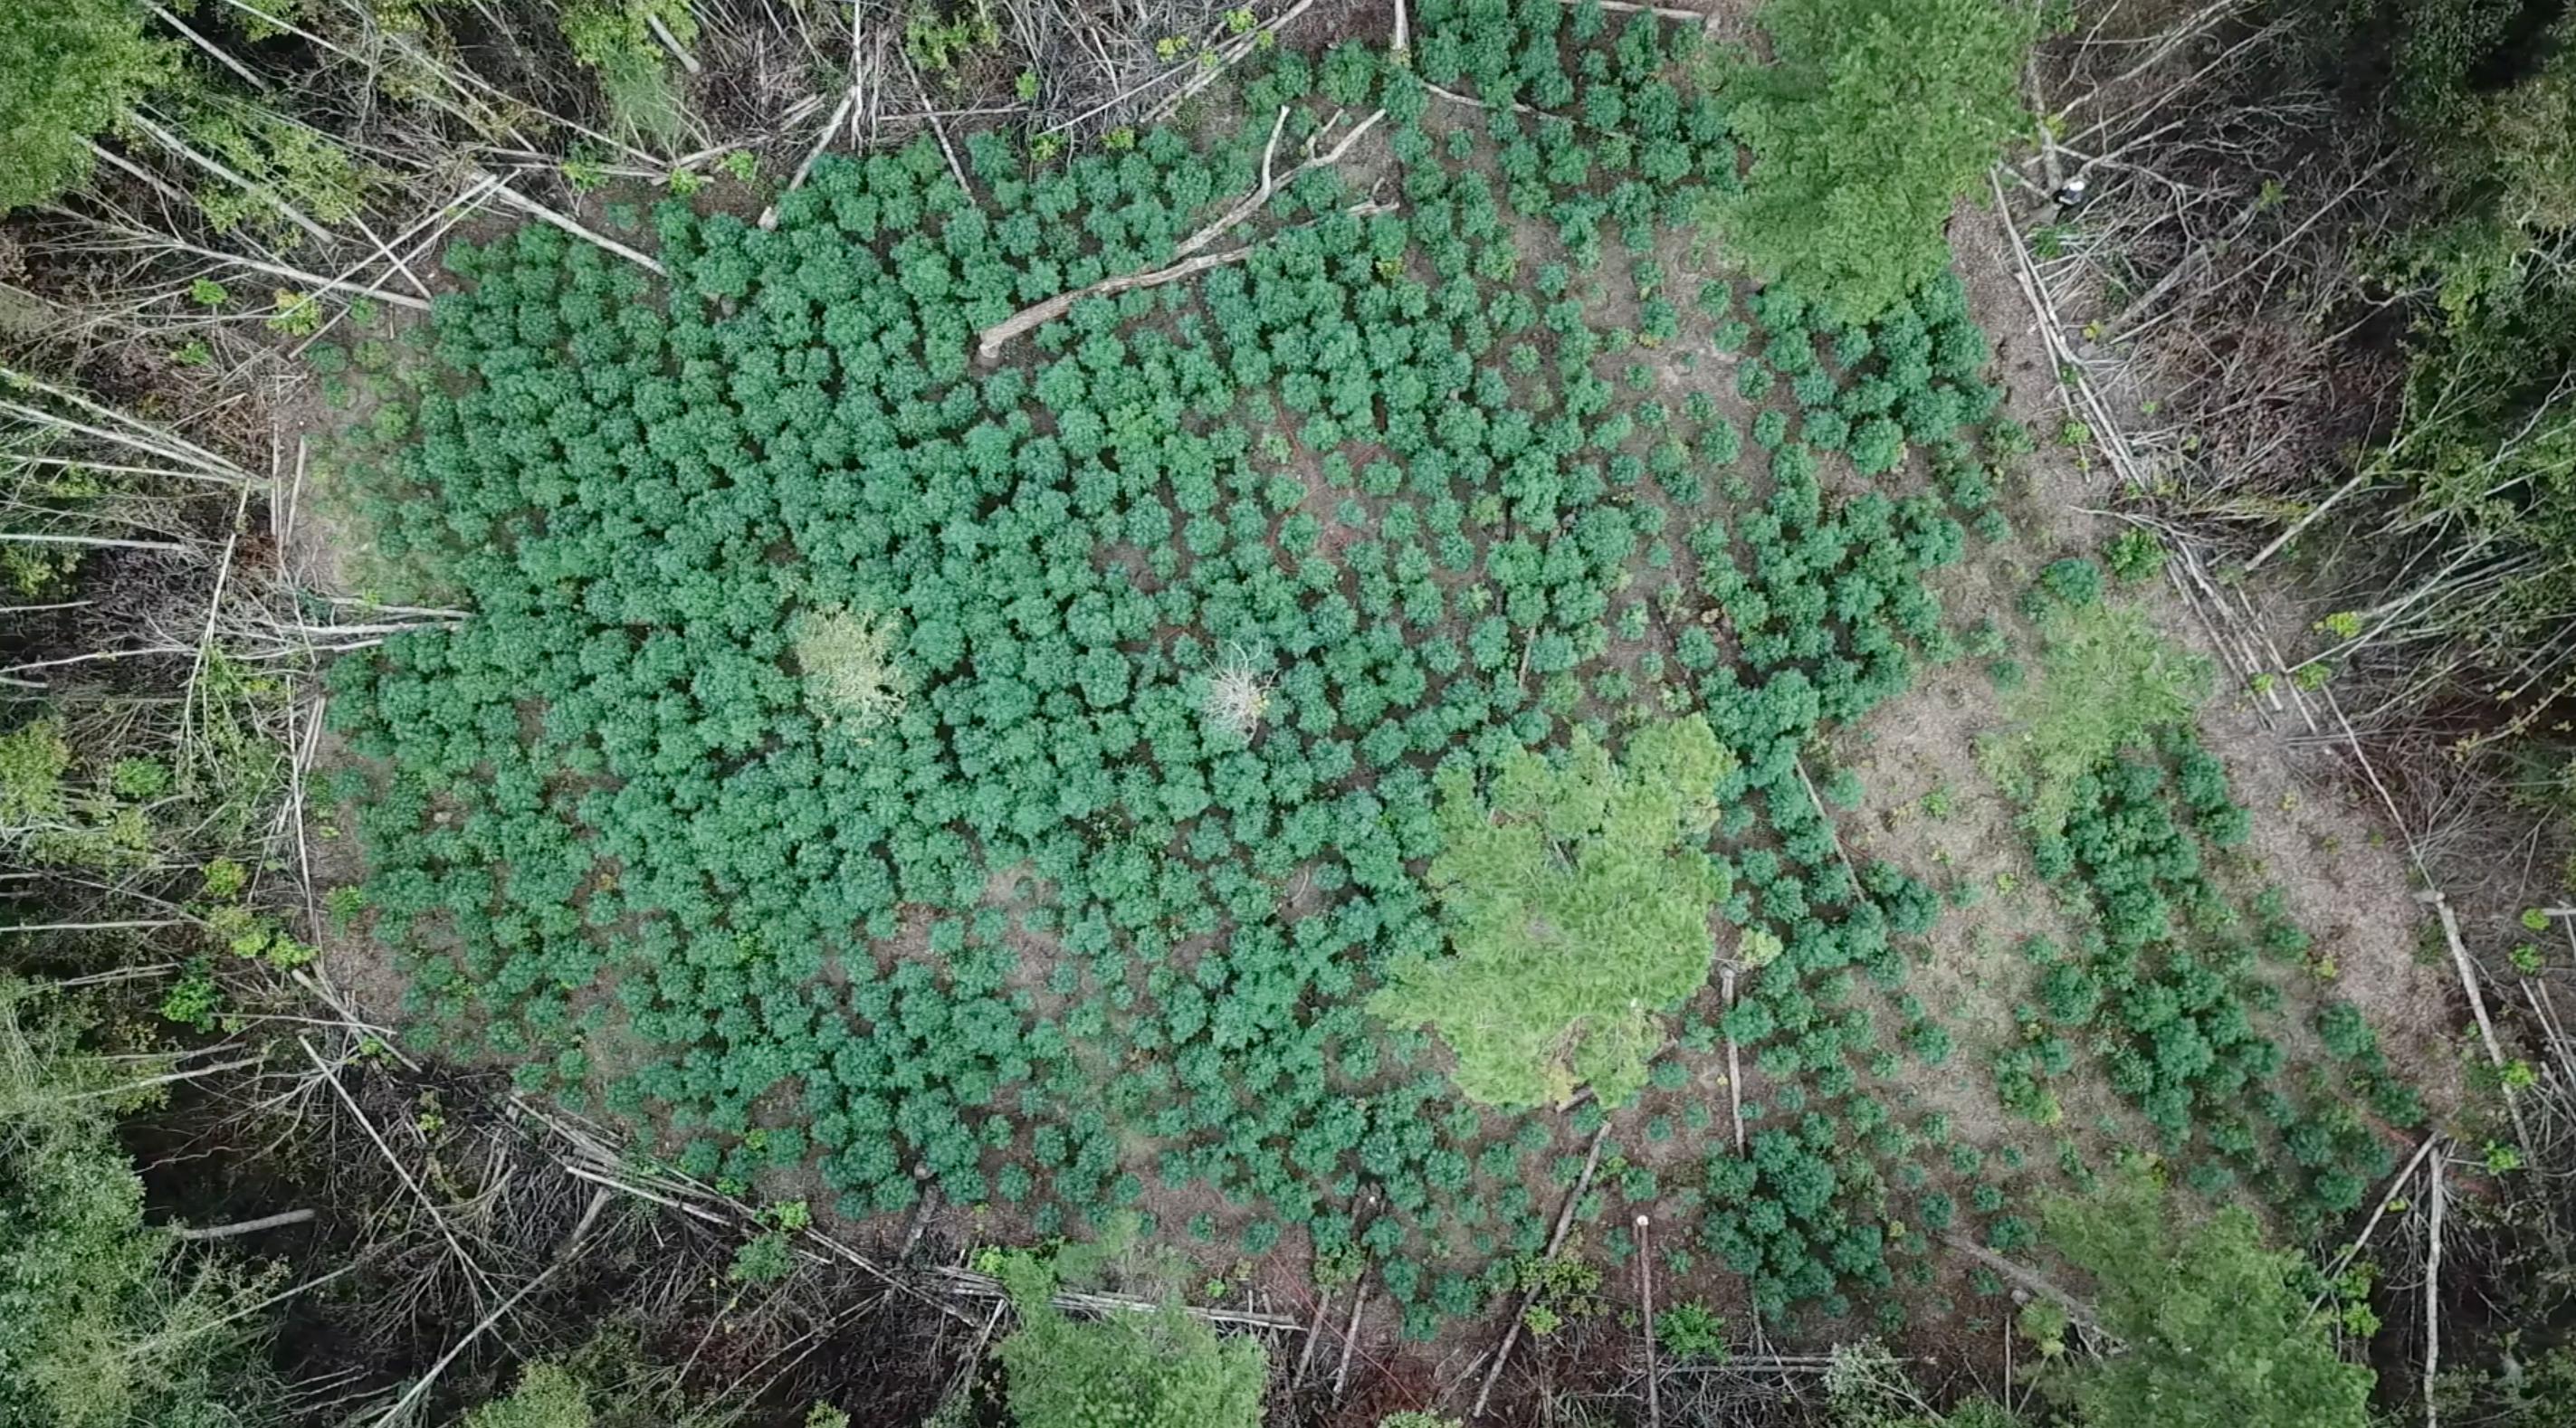 See drone footage of the $70M marijuana grow in Jeff Davis